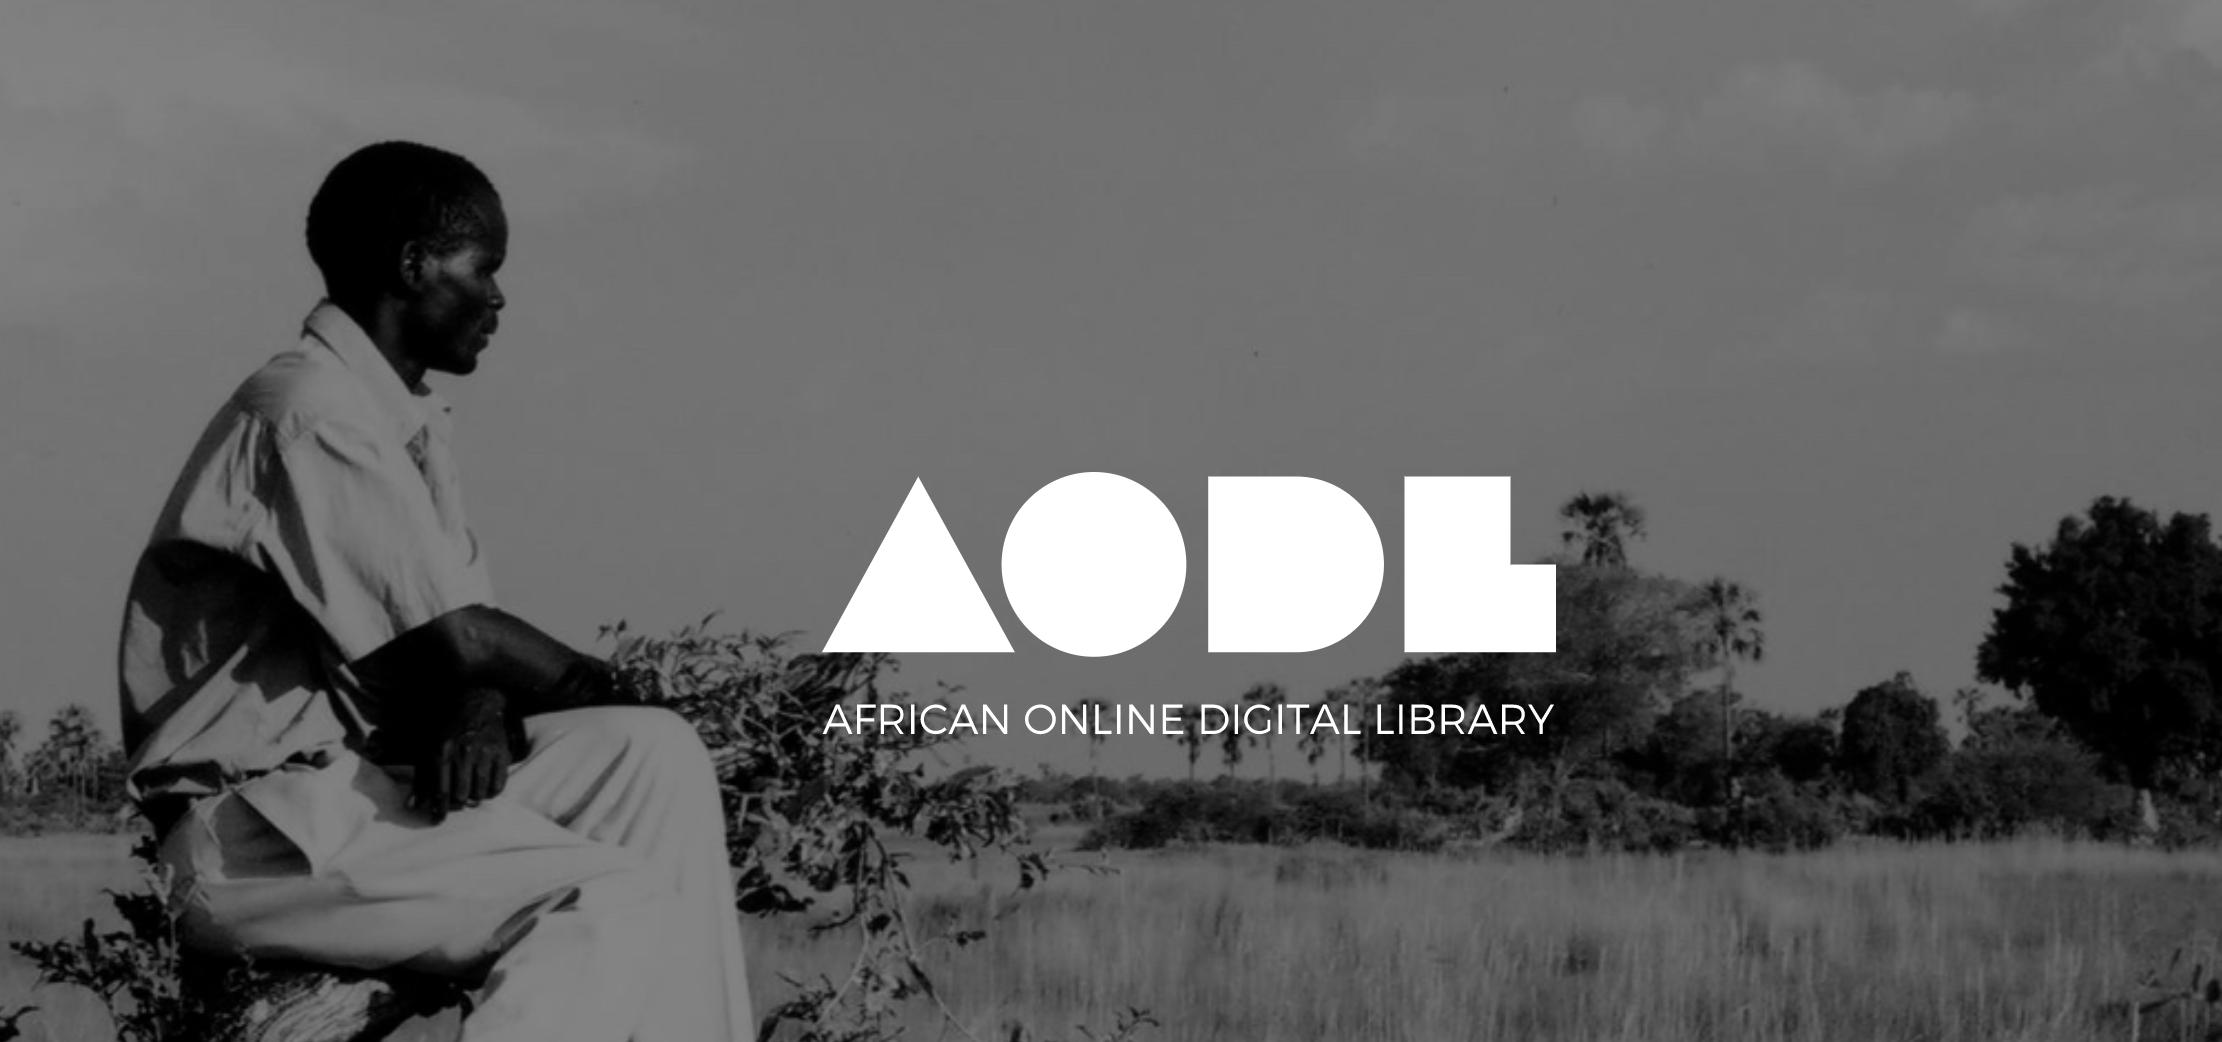 African Online Digital Library